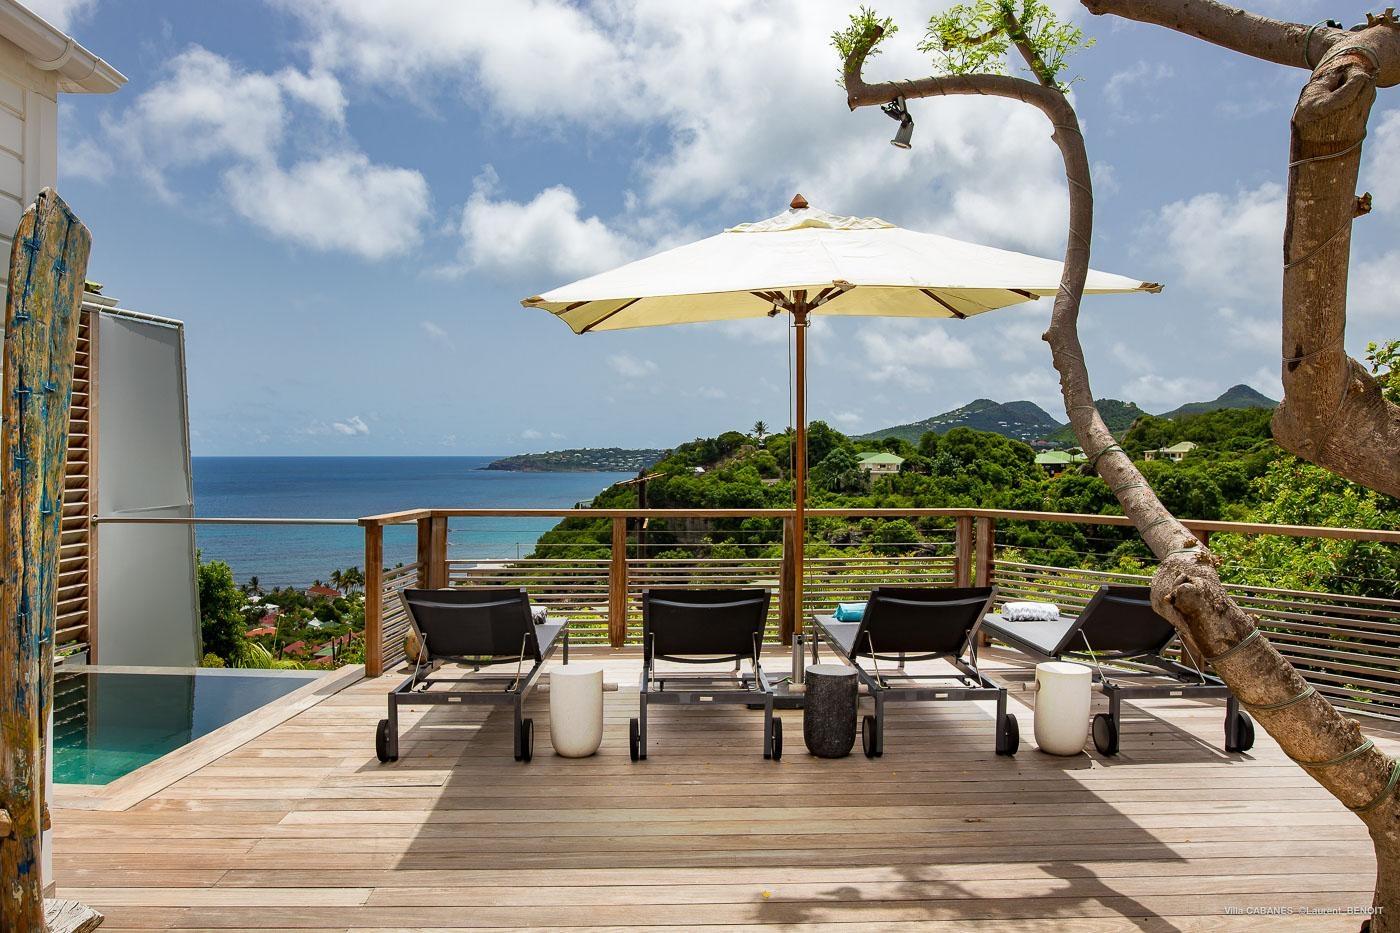 Luxury villa rentals caribbean - St barthelemy - Anse des cayes - Les Cabanes - Image 1/35